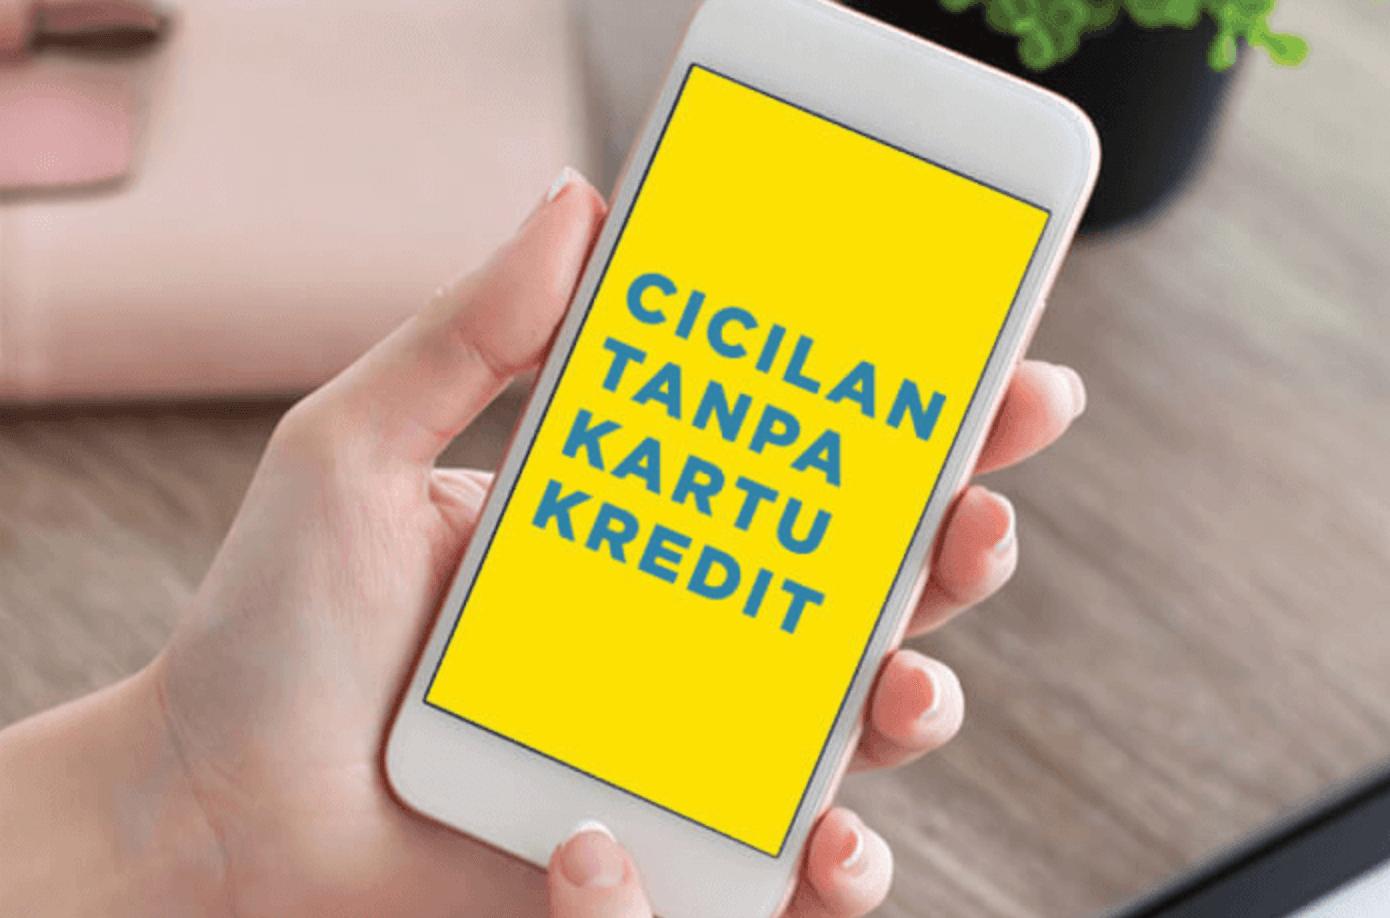 Ini 3 Aplikasi Cicilan HP Tanpa Kartu Kredit Paling Top